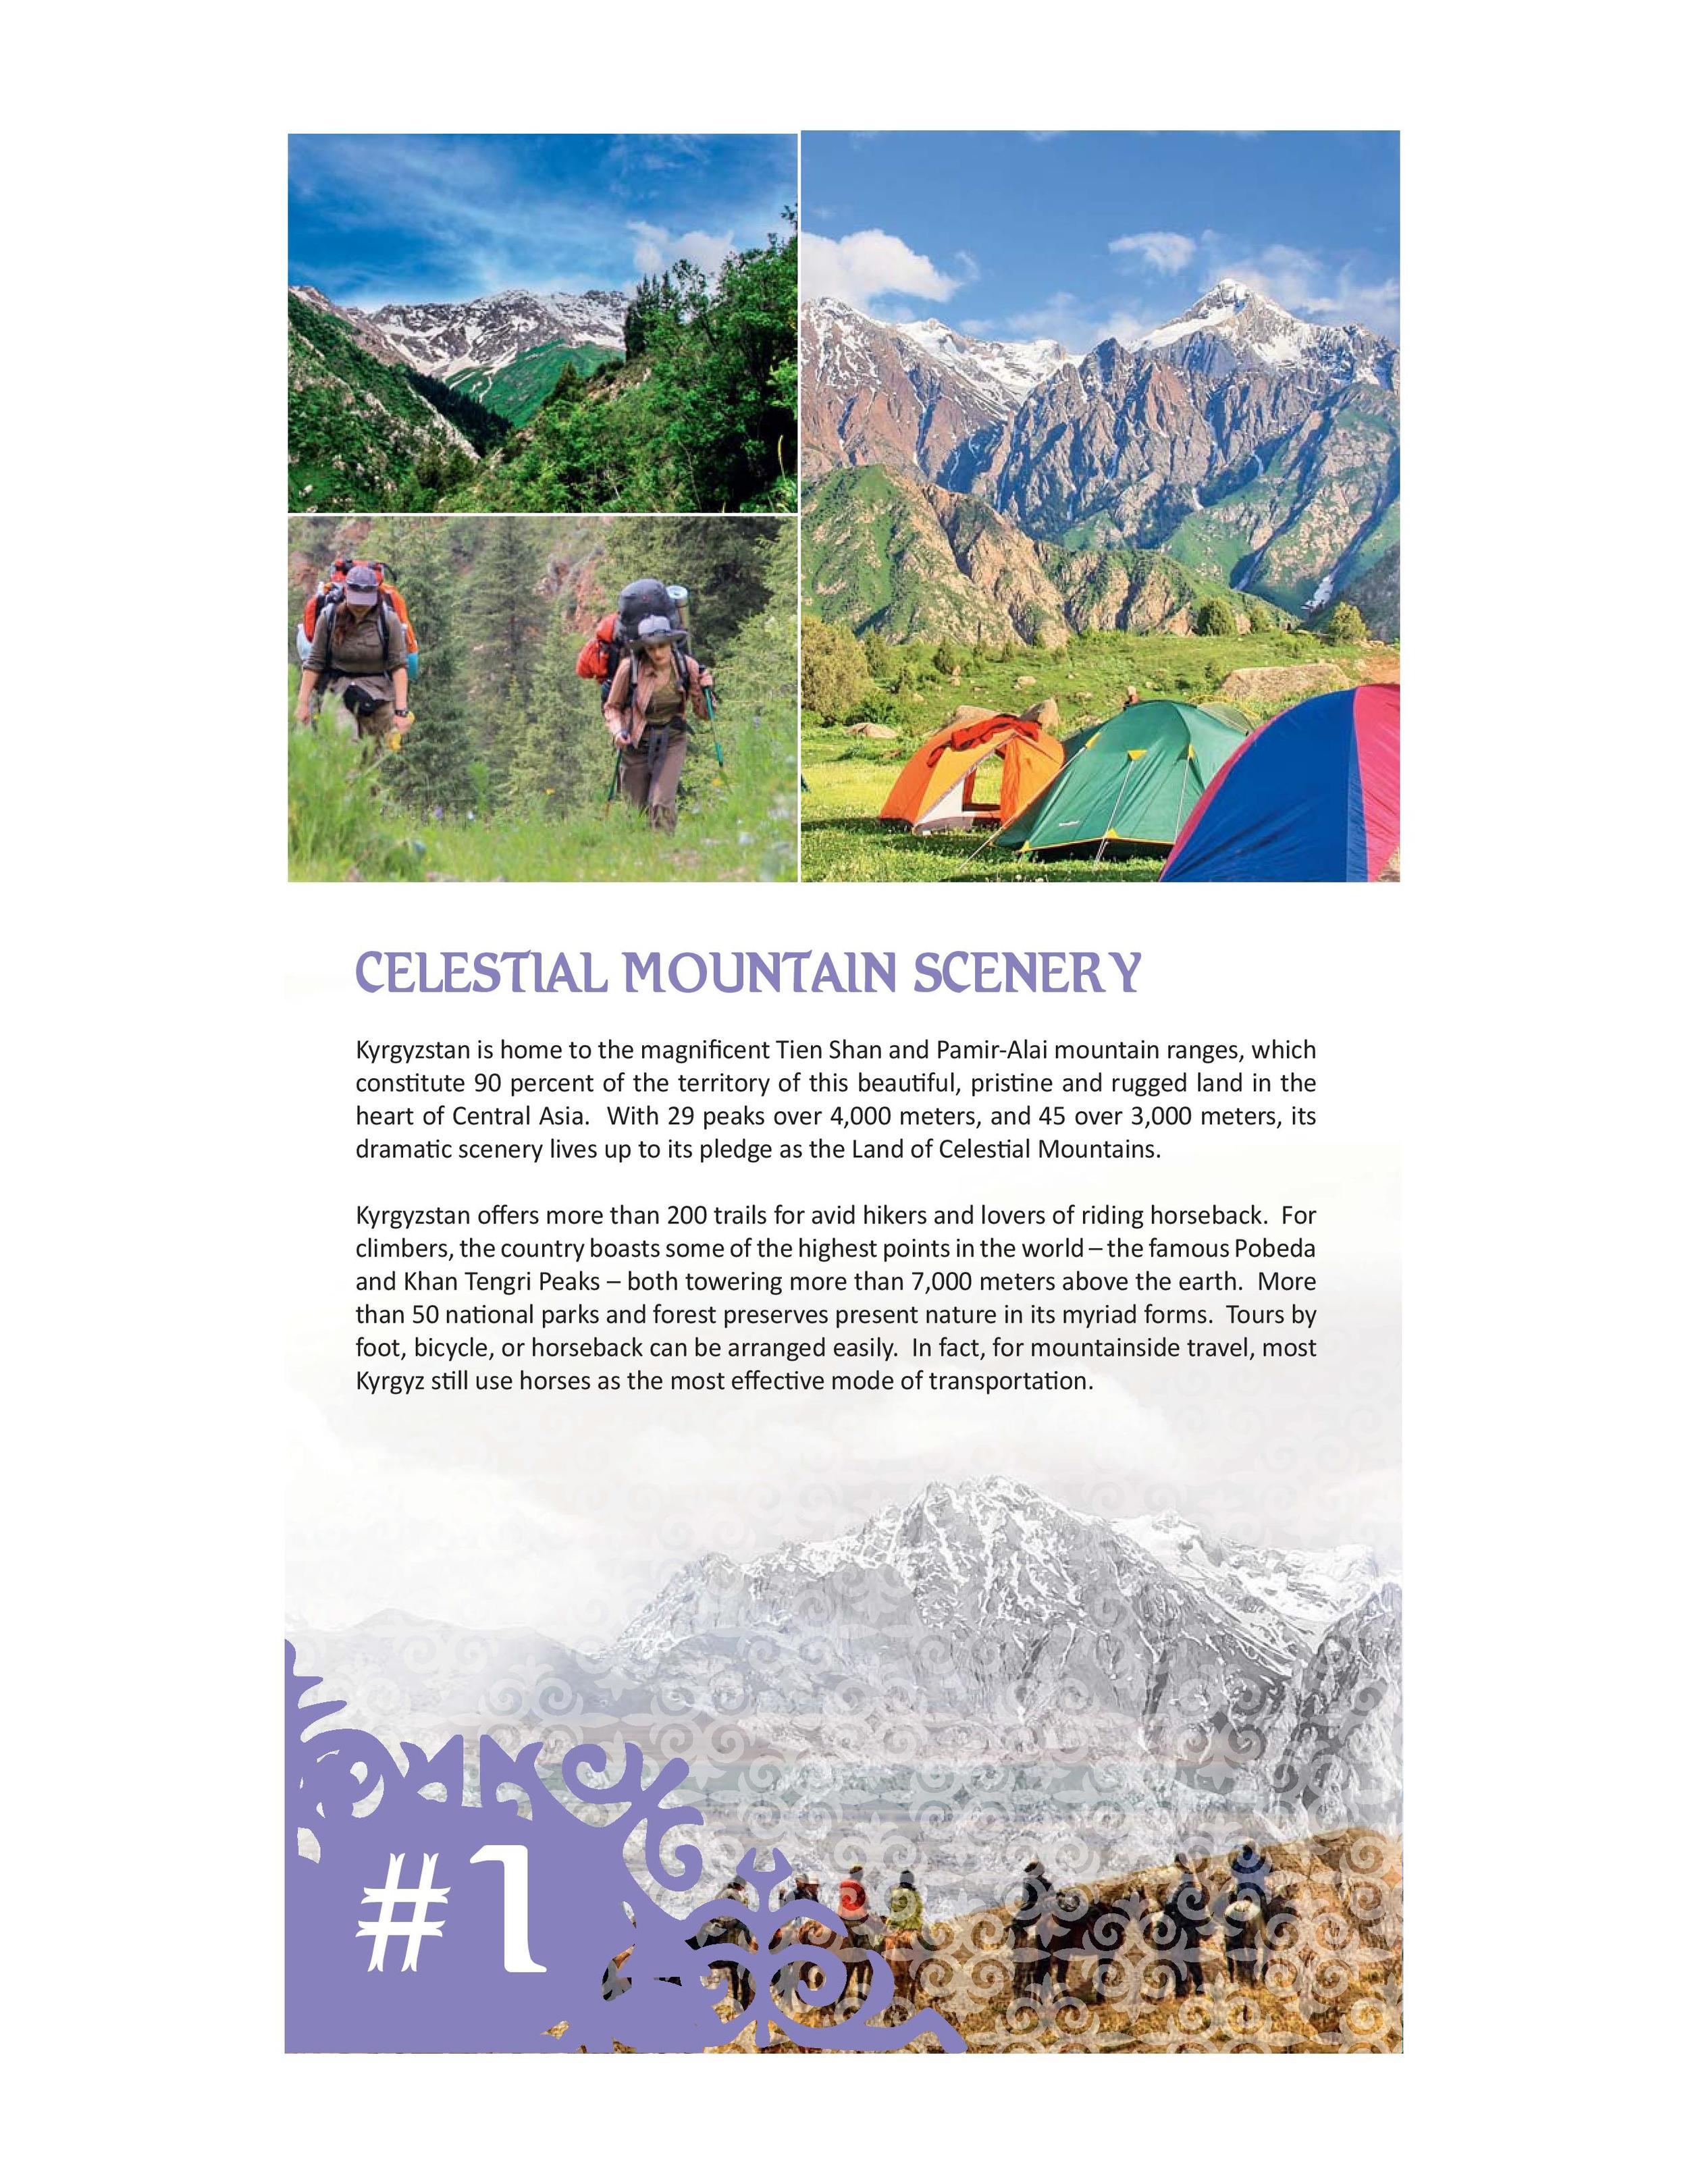 10 reasons to explore Kyrgyzstan_SMALL-page-002.jpg